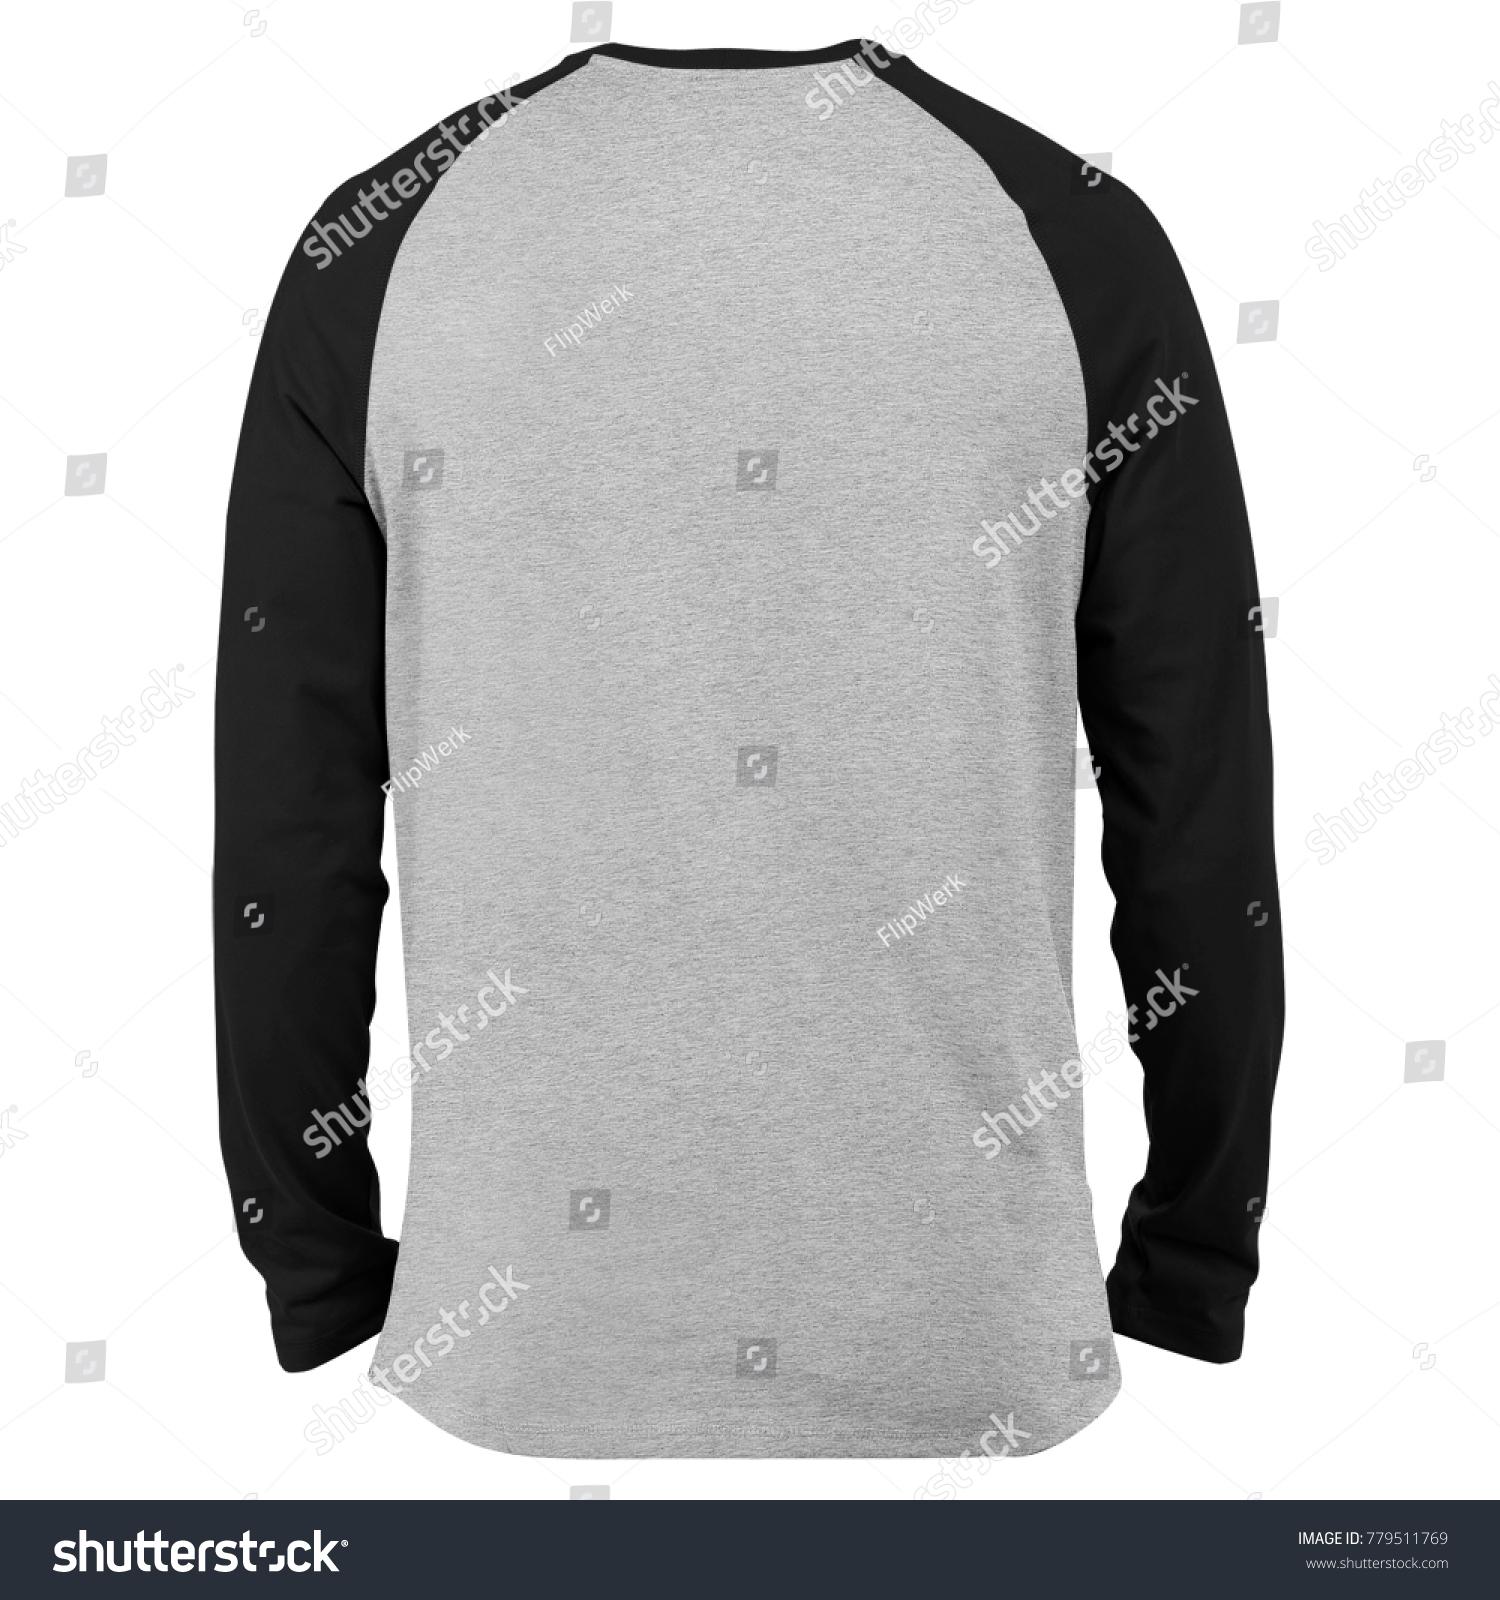 049886580 blank t shirt raglan long sleeve template for mockup in white background